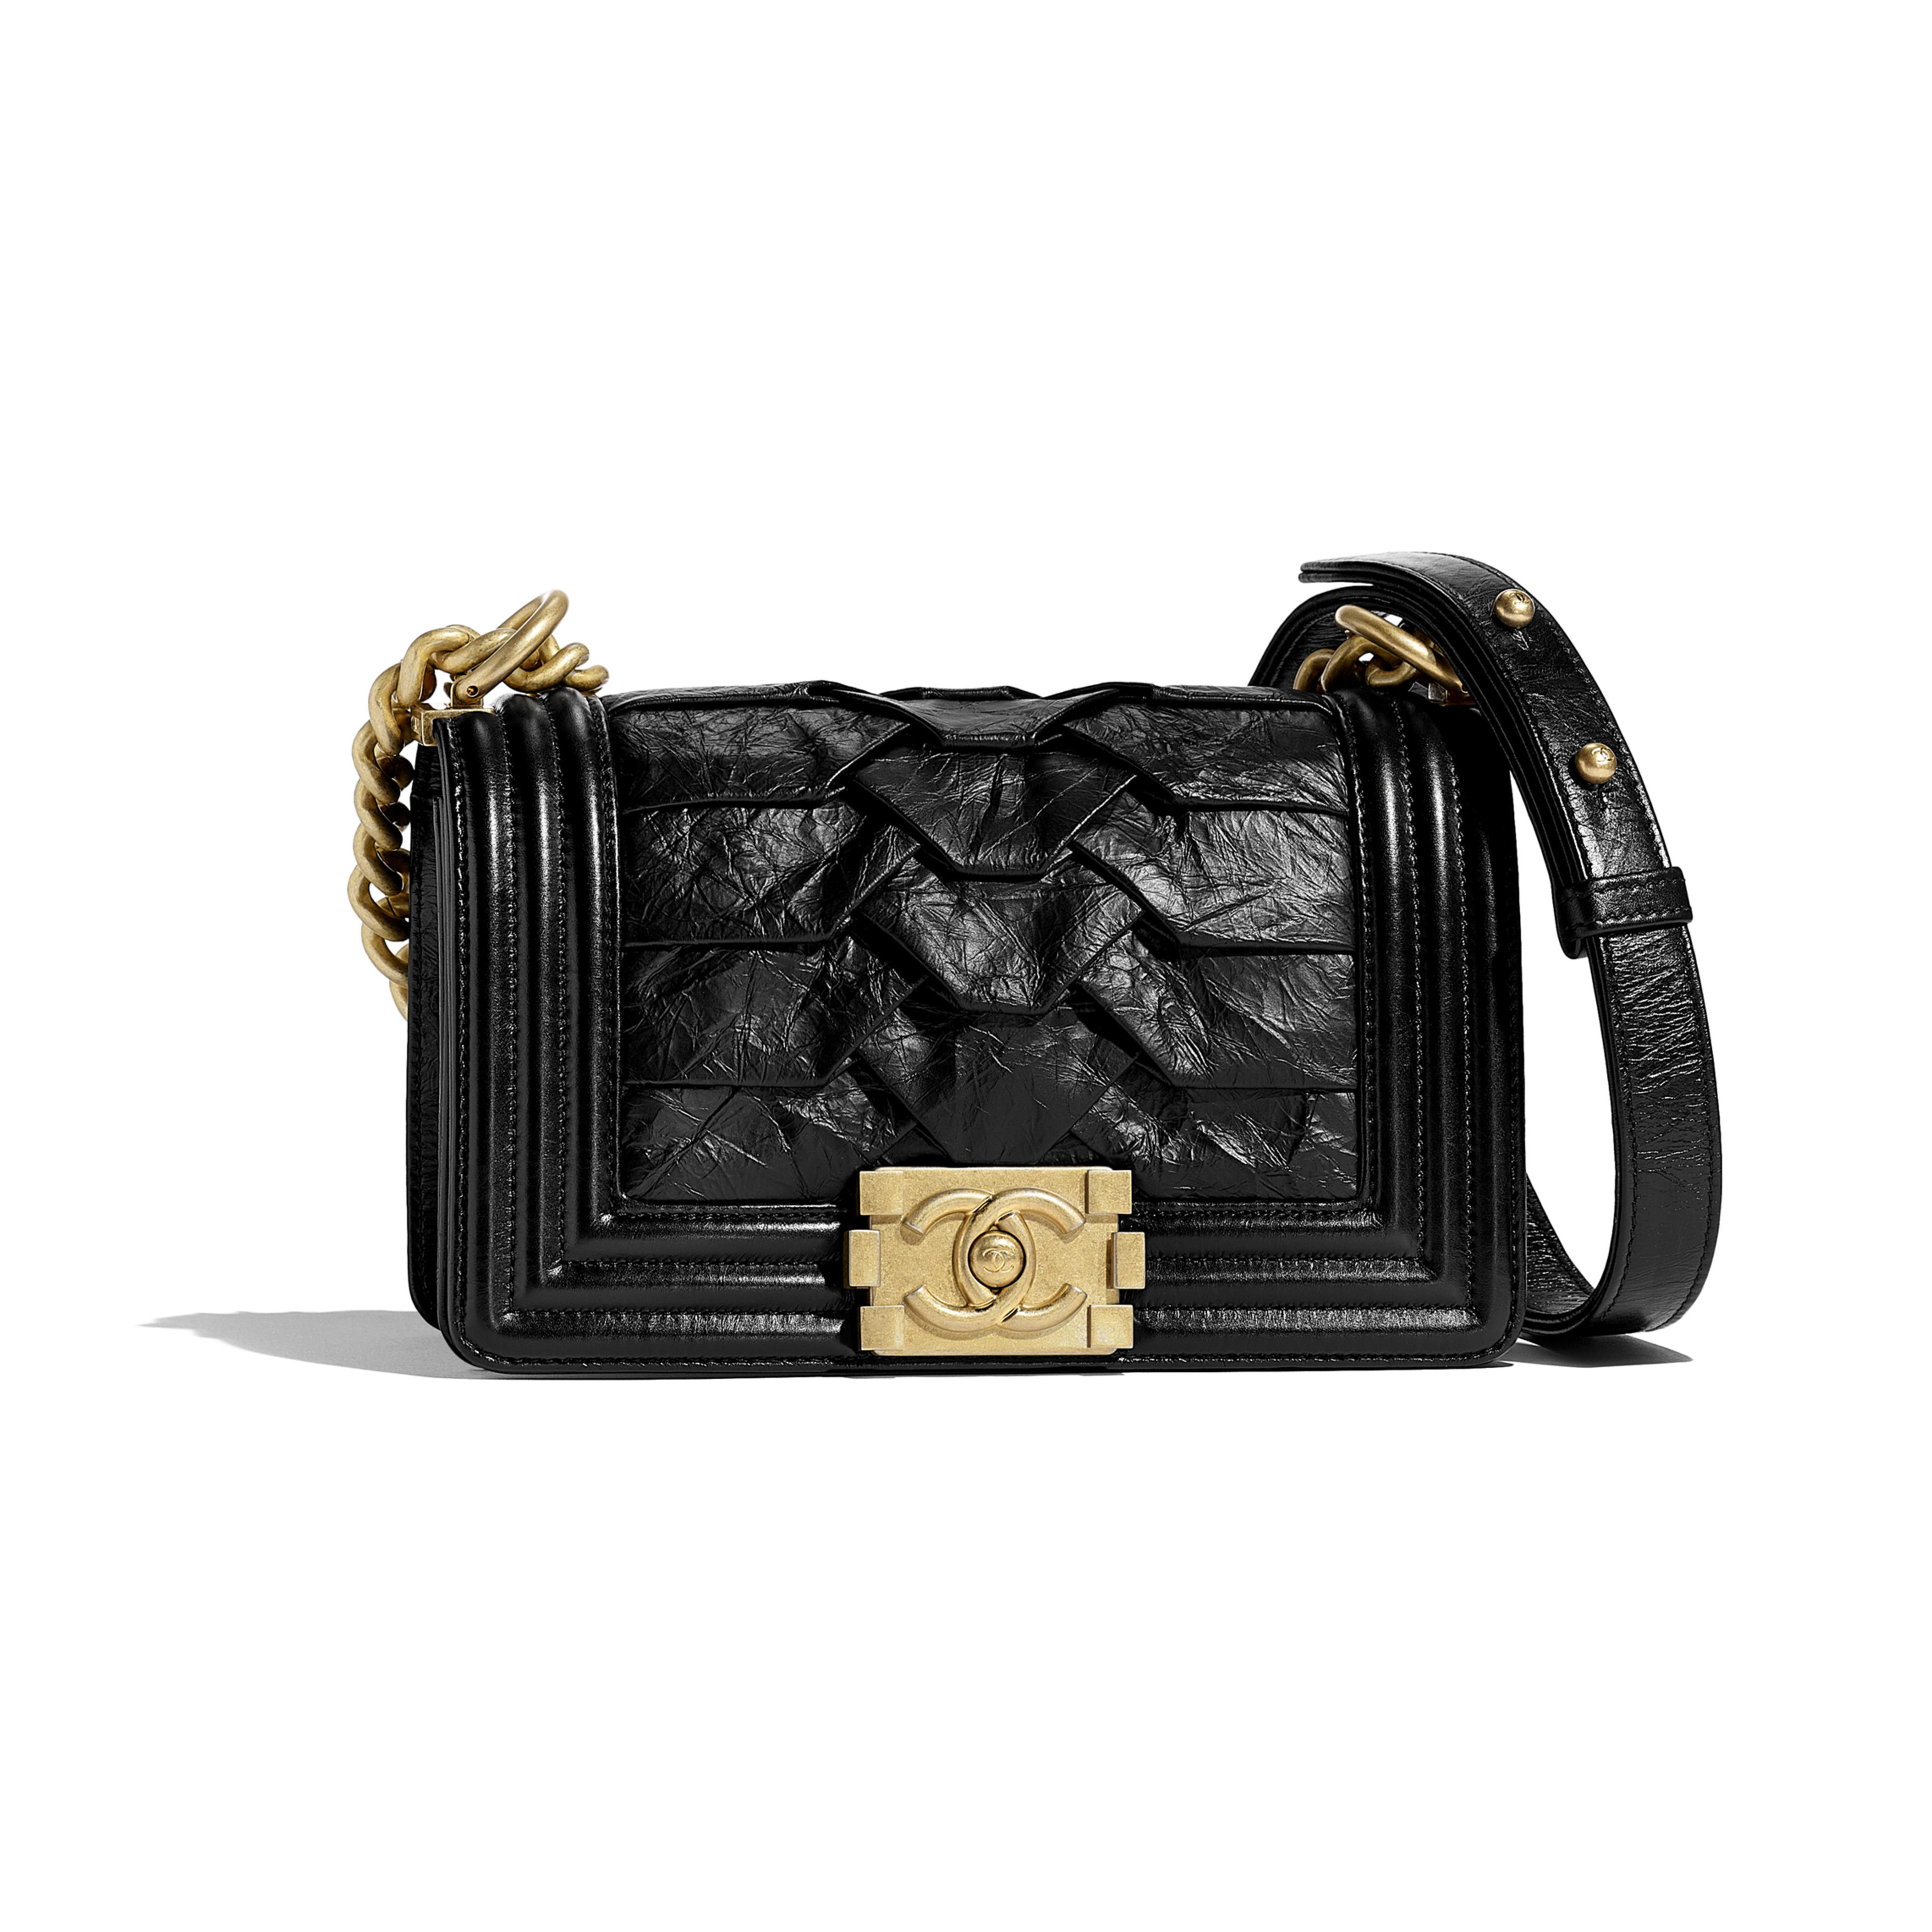 Small BOY CHANEL Handbag - Black - Crumpled Calfskin & Gold-Tone Metal - Default view - see full sized version